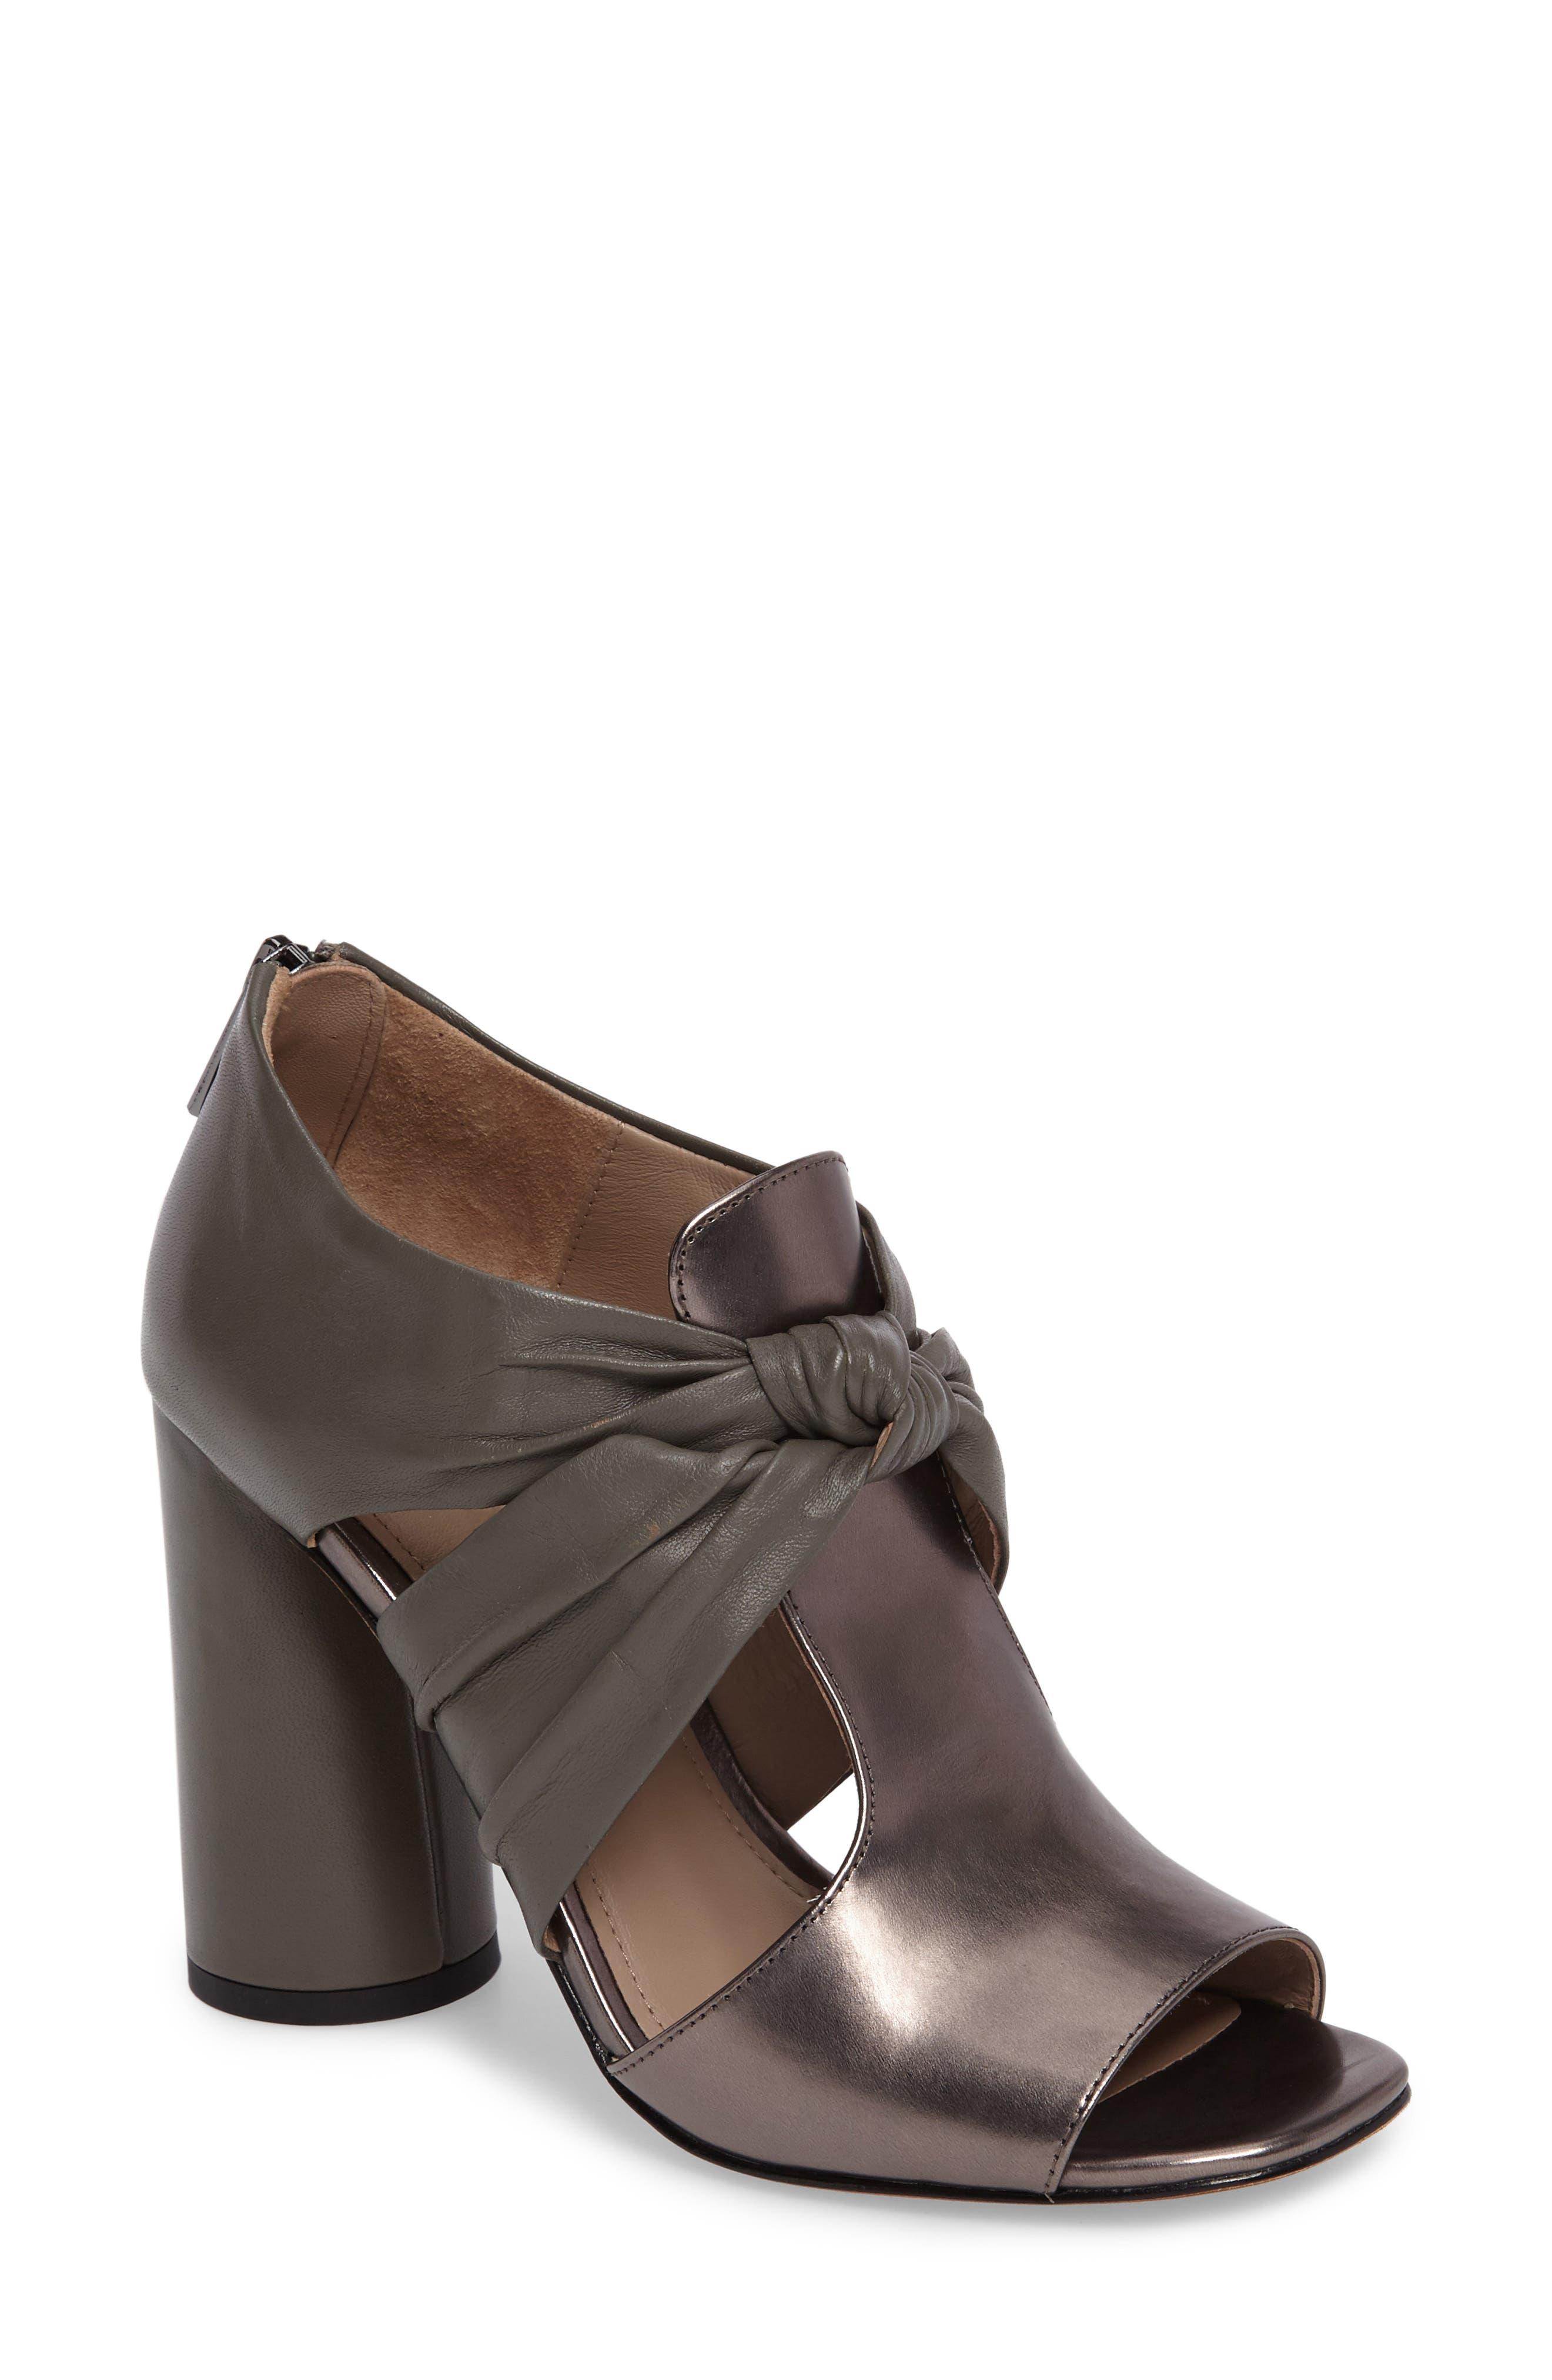 Donald J Pliner Bailey Knotted Column Heel Sandal (Women)